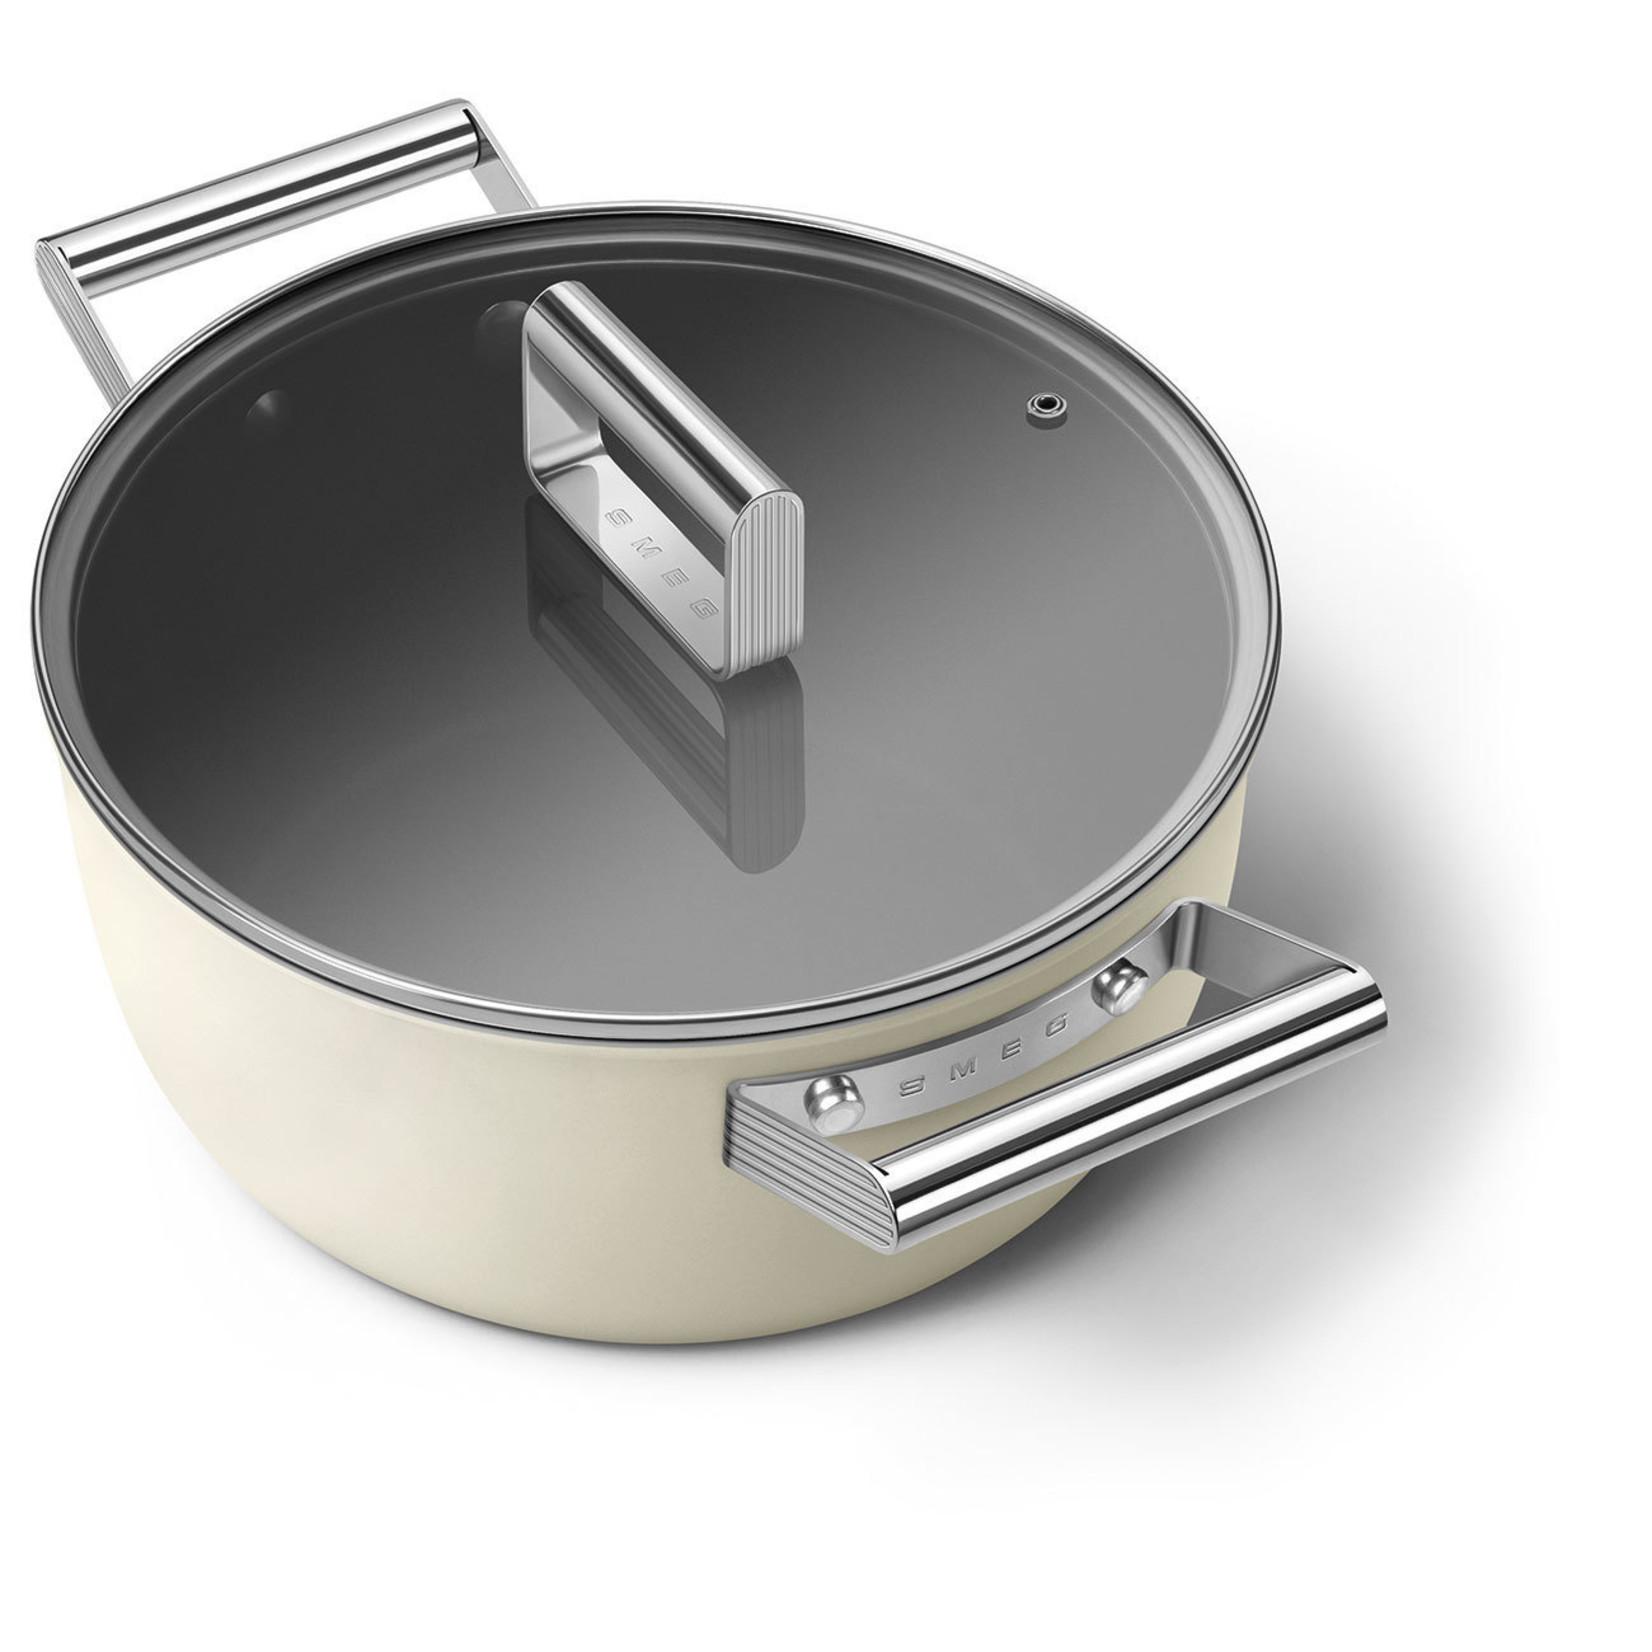 Smeg SMEG Kookpan met deksel 24 cm, anti-aanbaklaag, crème mat